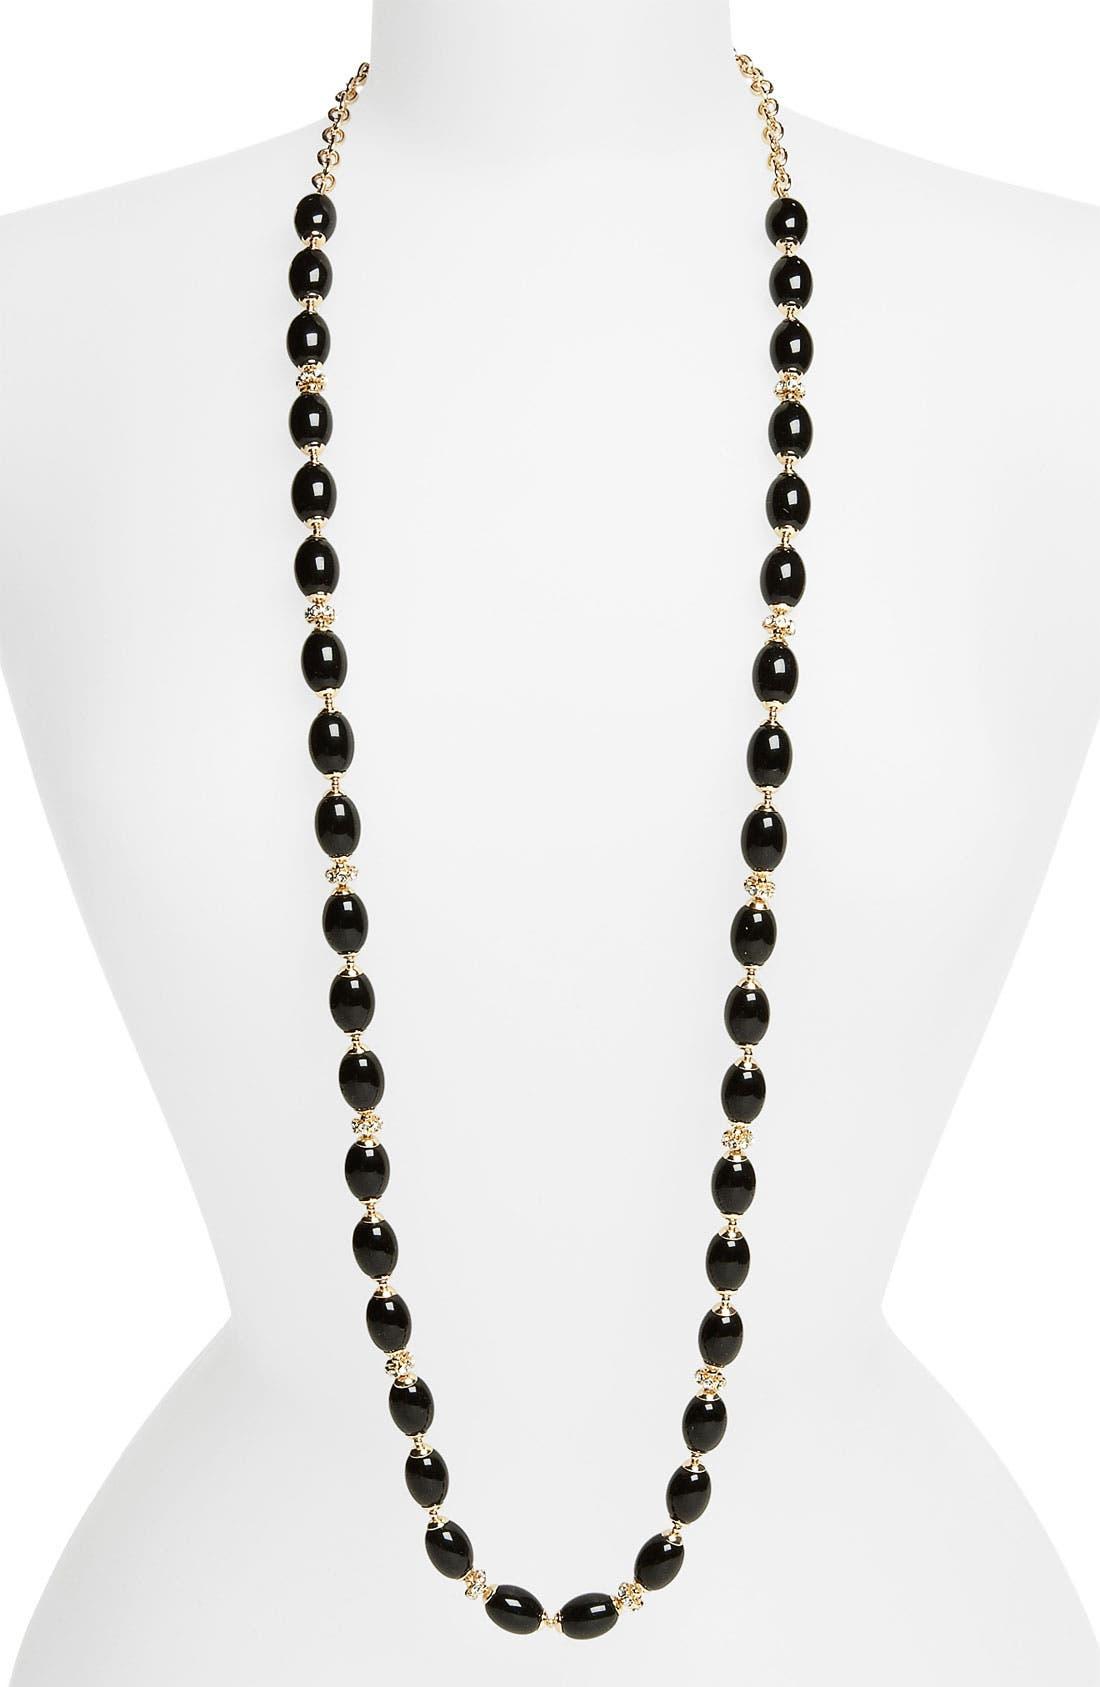 Main Image - Anne Klein 'Alder' Extra Long Bead Necklace